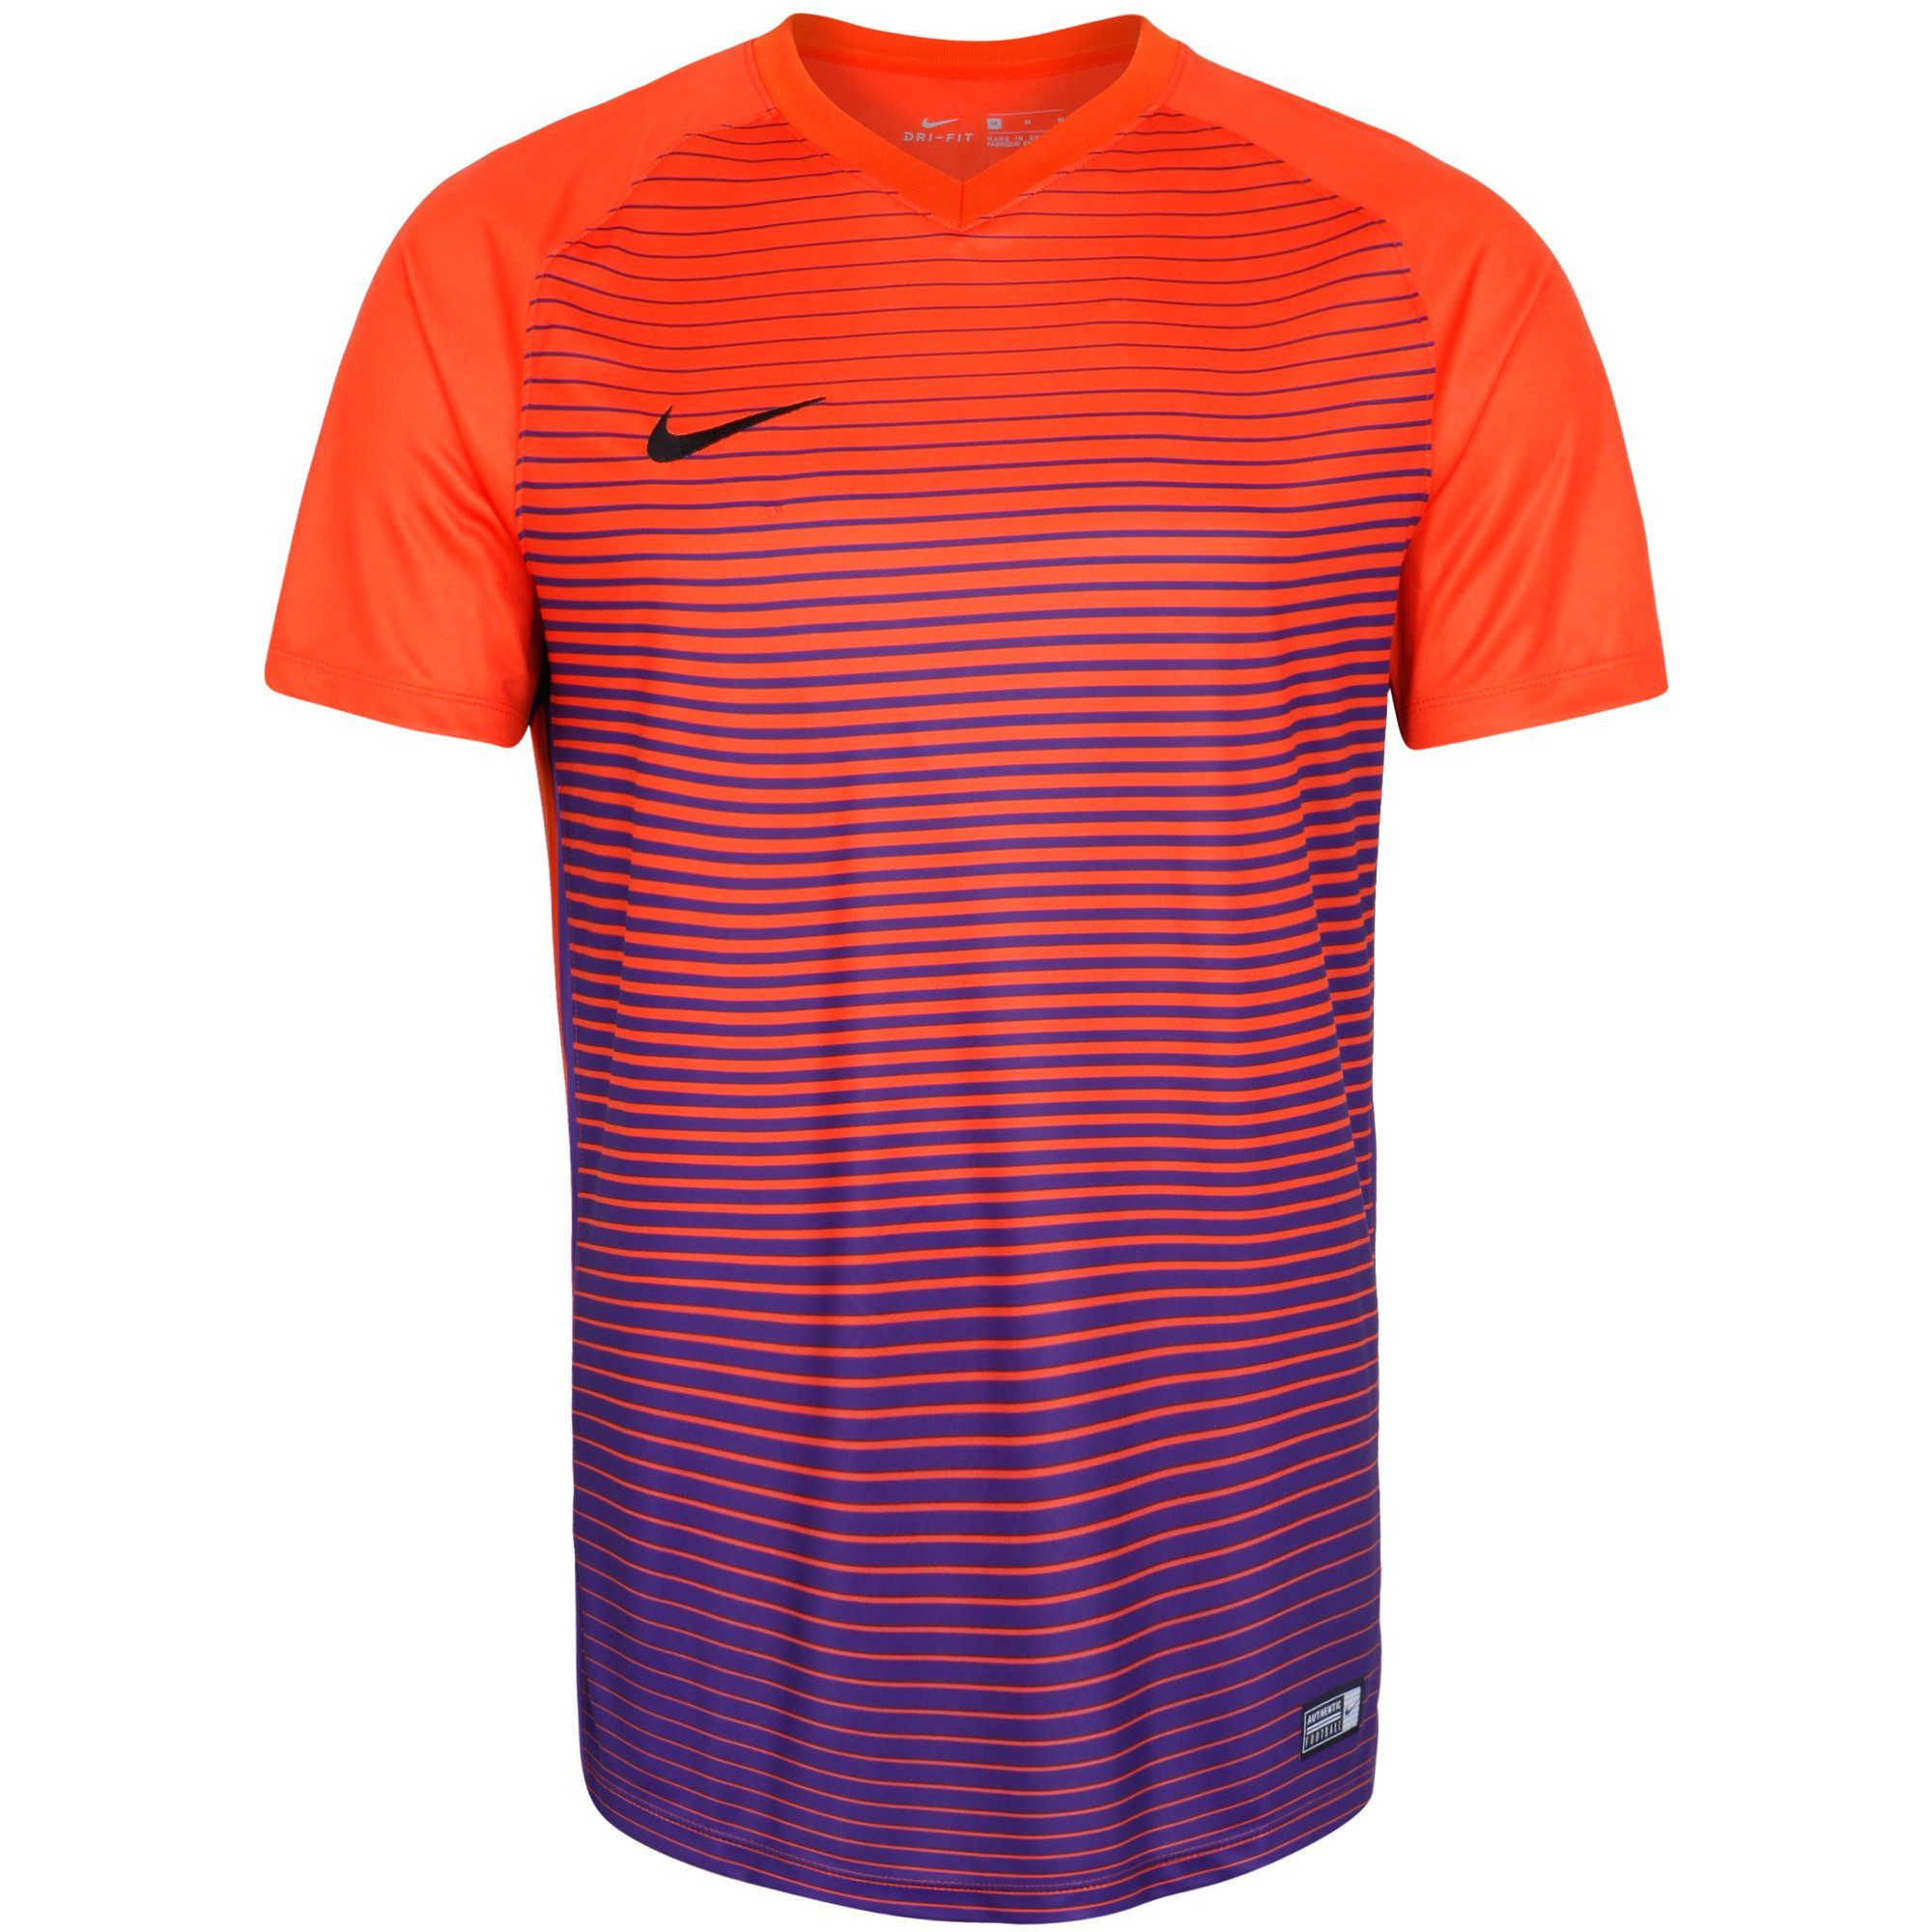 Nike Fußballtrikot Precision Iv | Sportbekleidung > Trikots > Fußballtrikots | Orange | Ab - Trikot | Nike